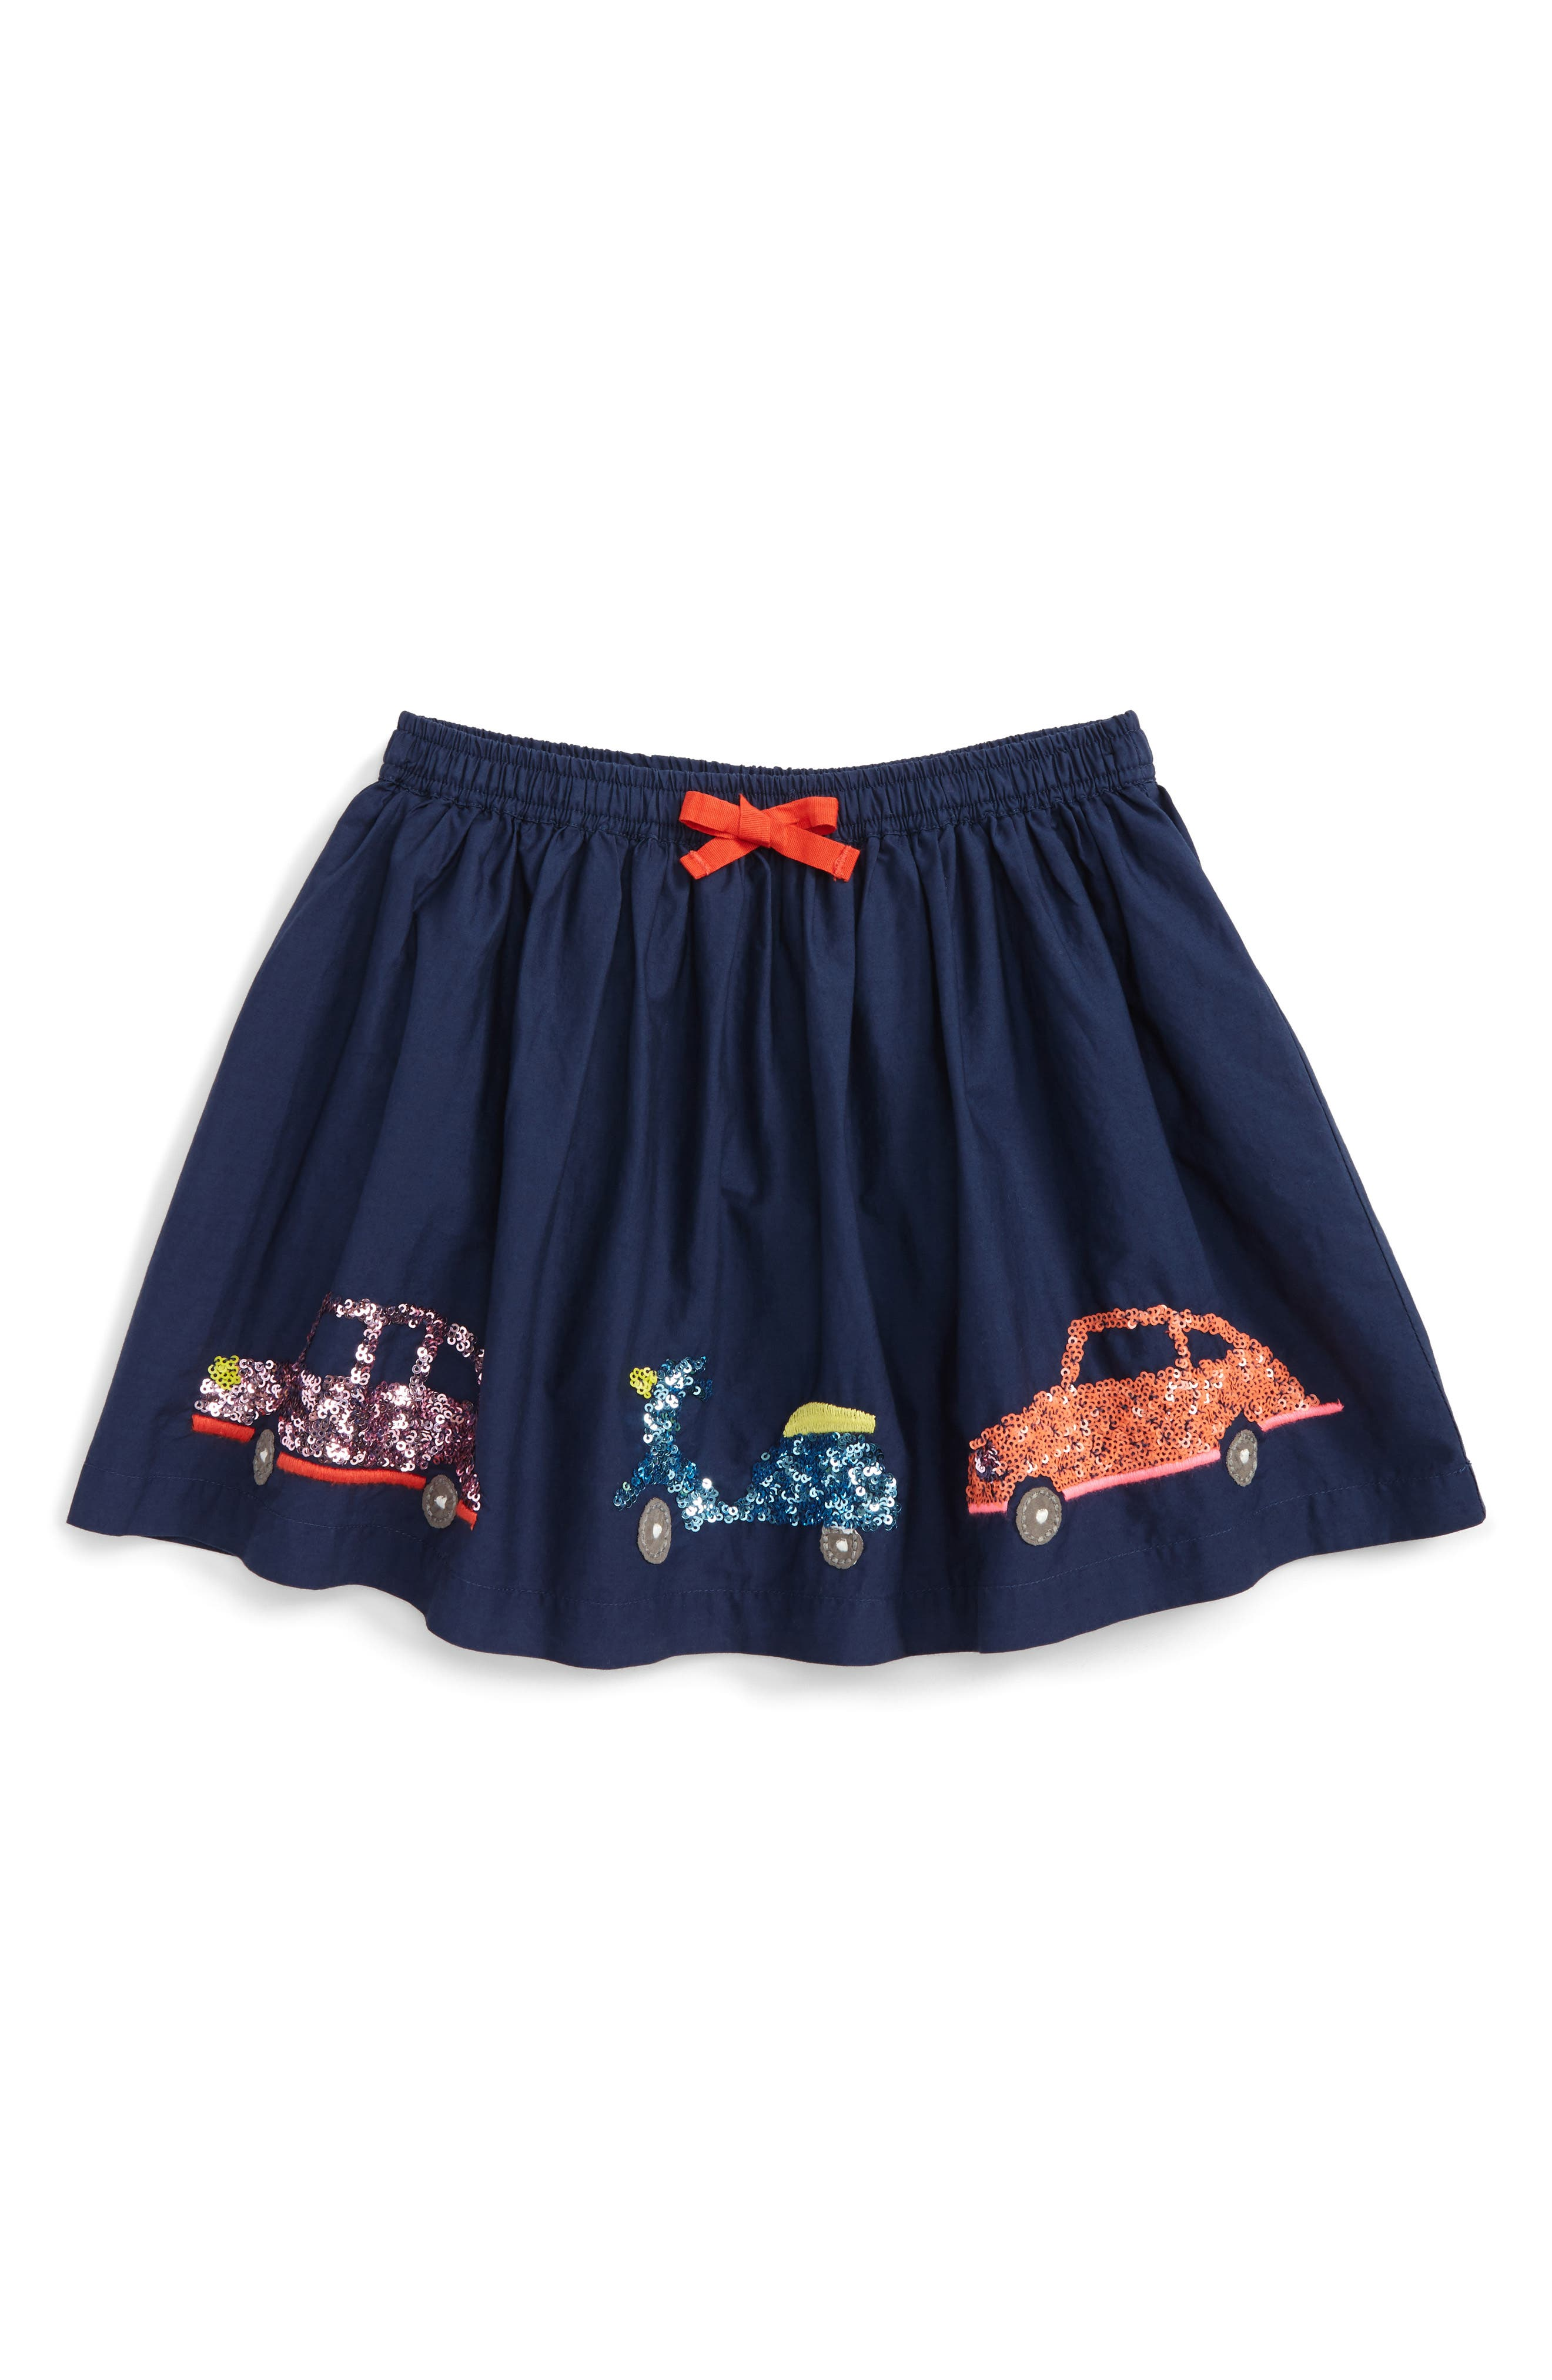 Main Image - Mini Boden Adventure Sequin Skirt (Toddler Girls, Little Girls & Big Girls)